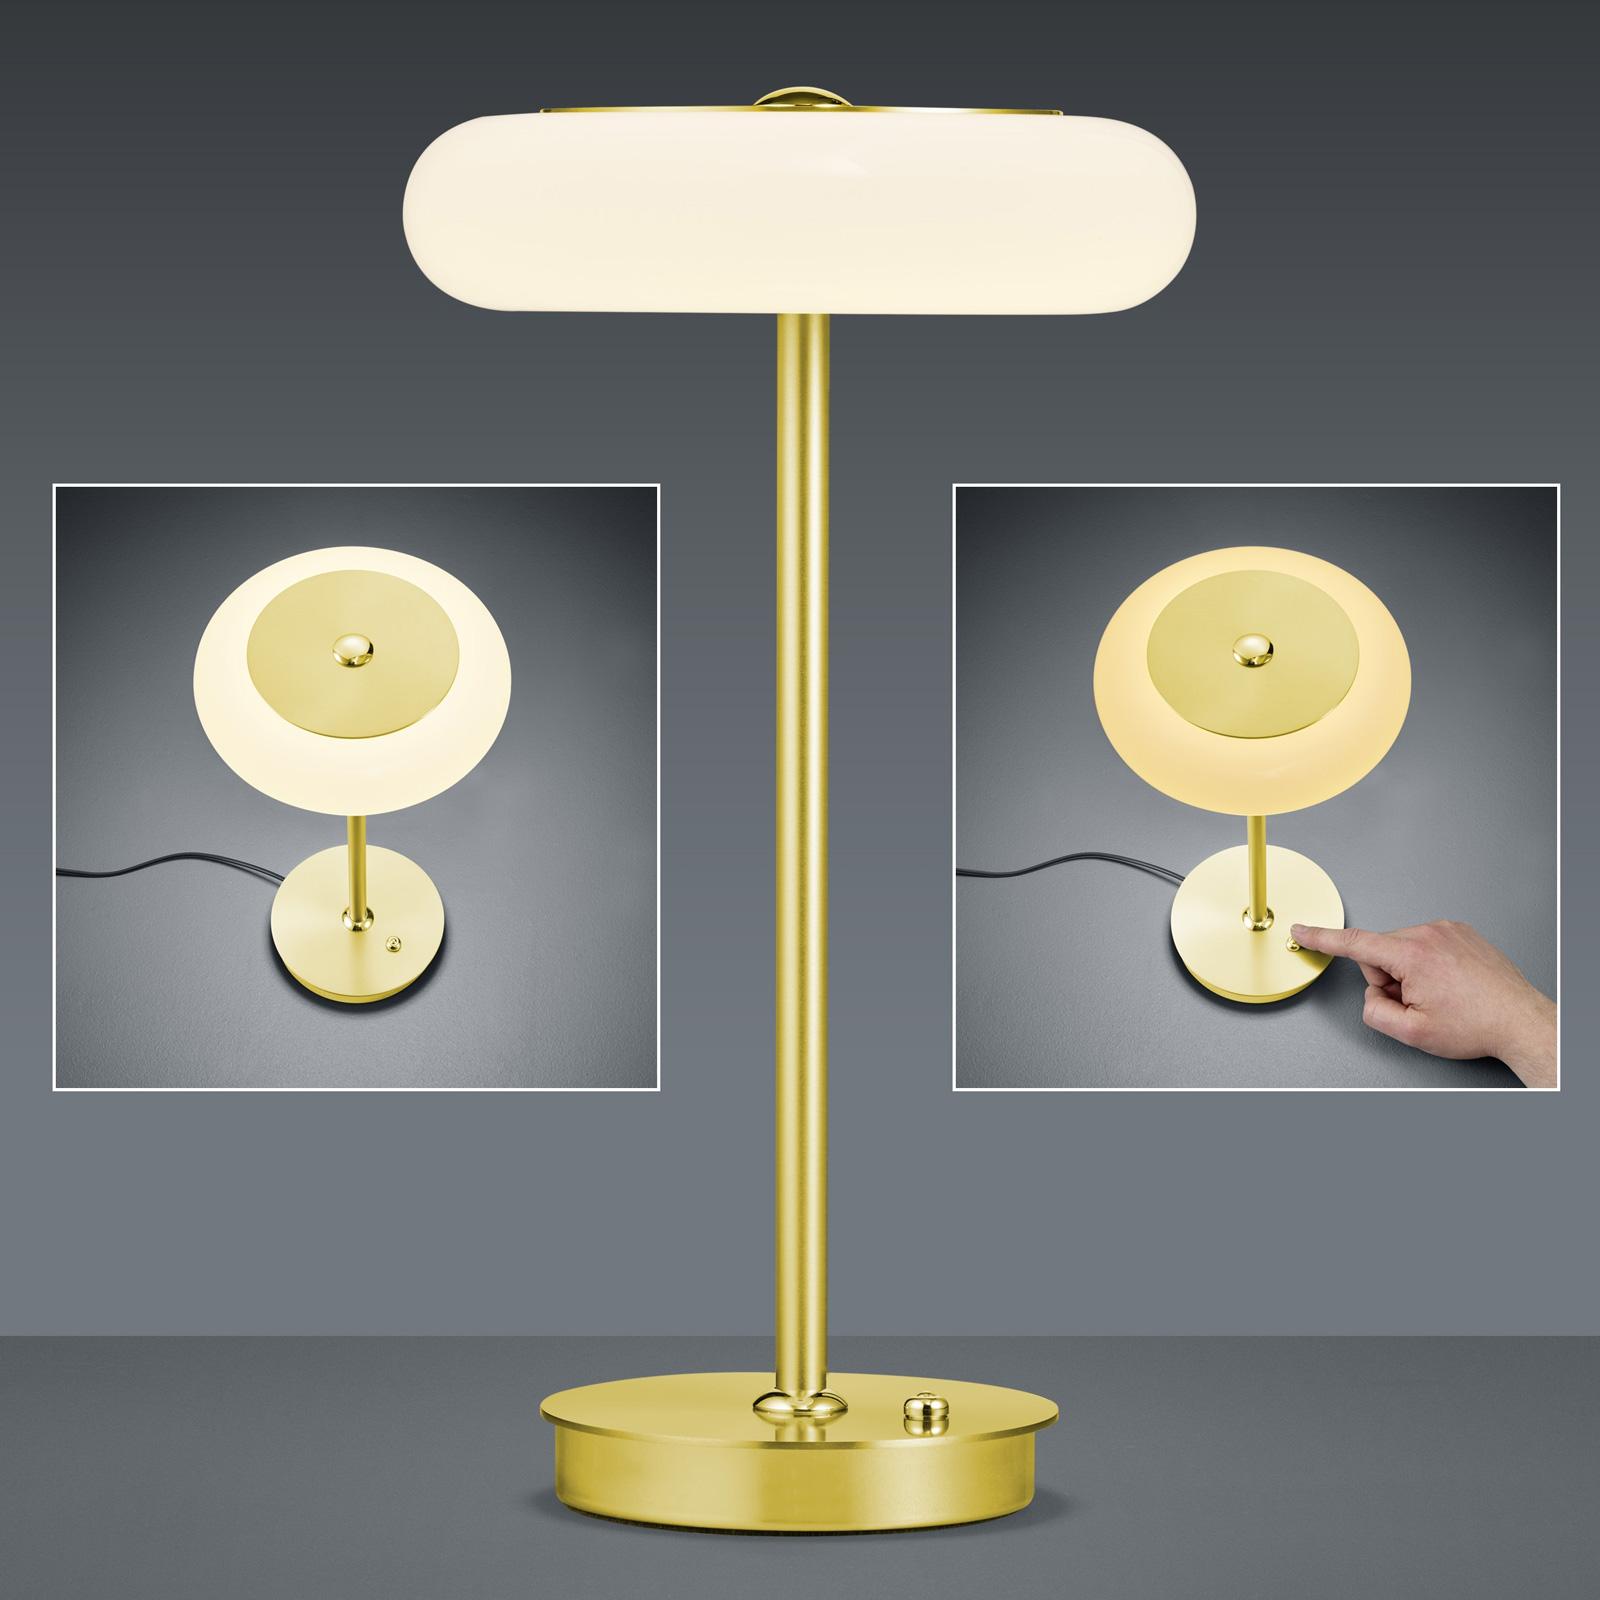 BANKAMP Centa lampe à poser LED, laiton